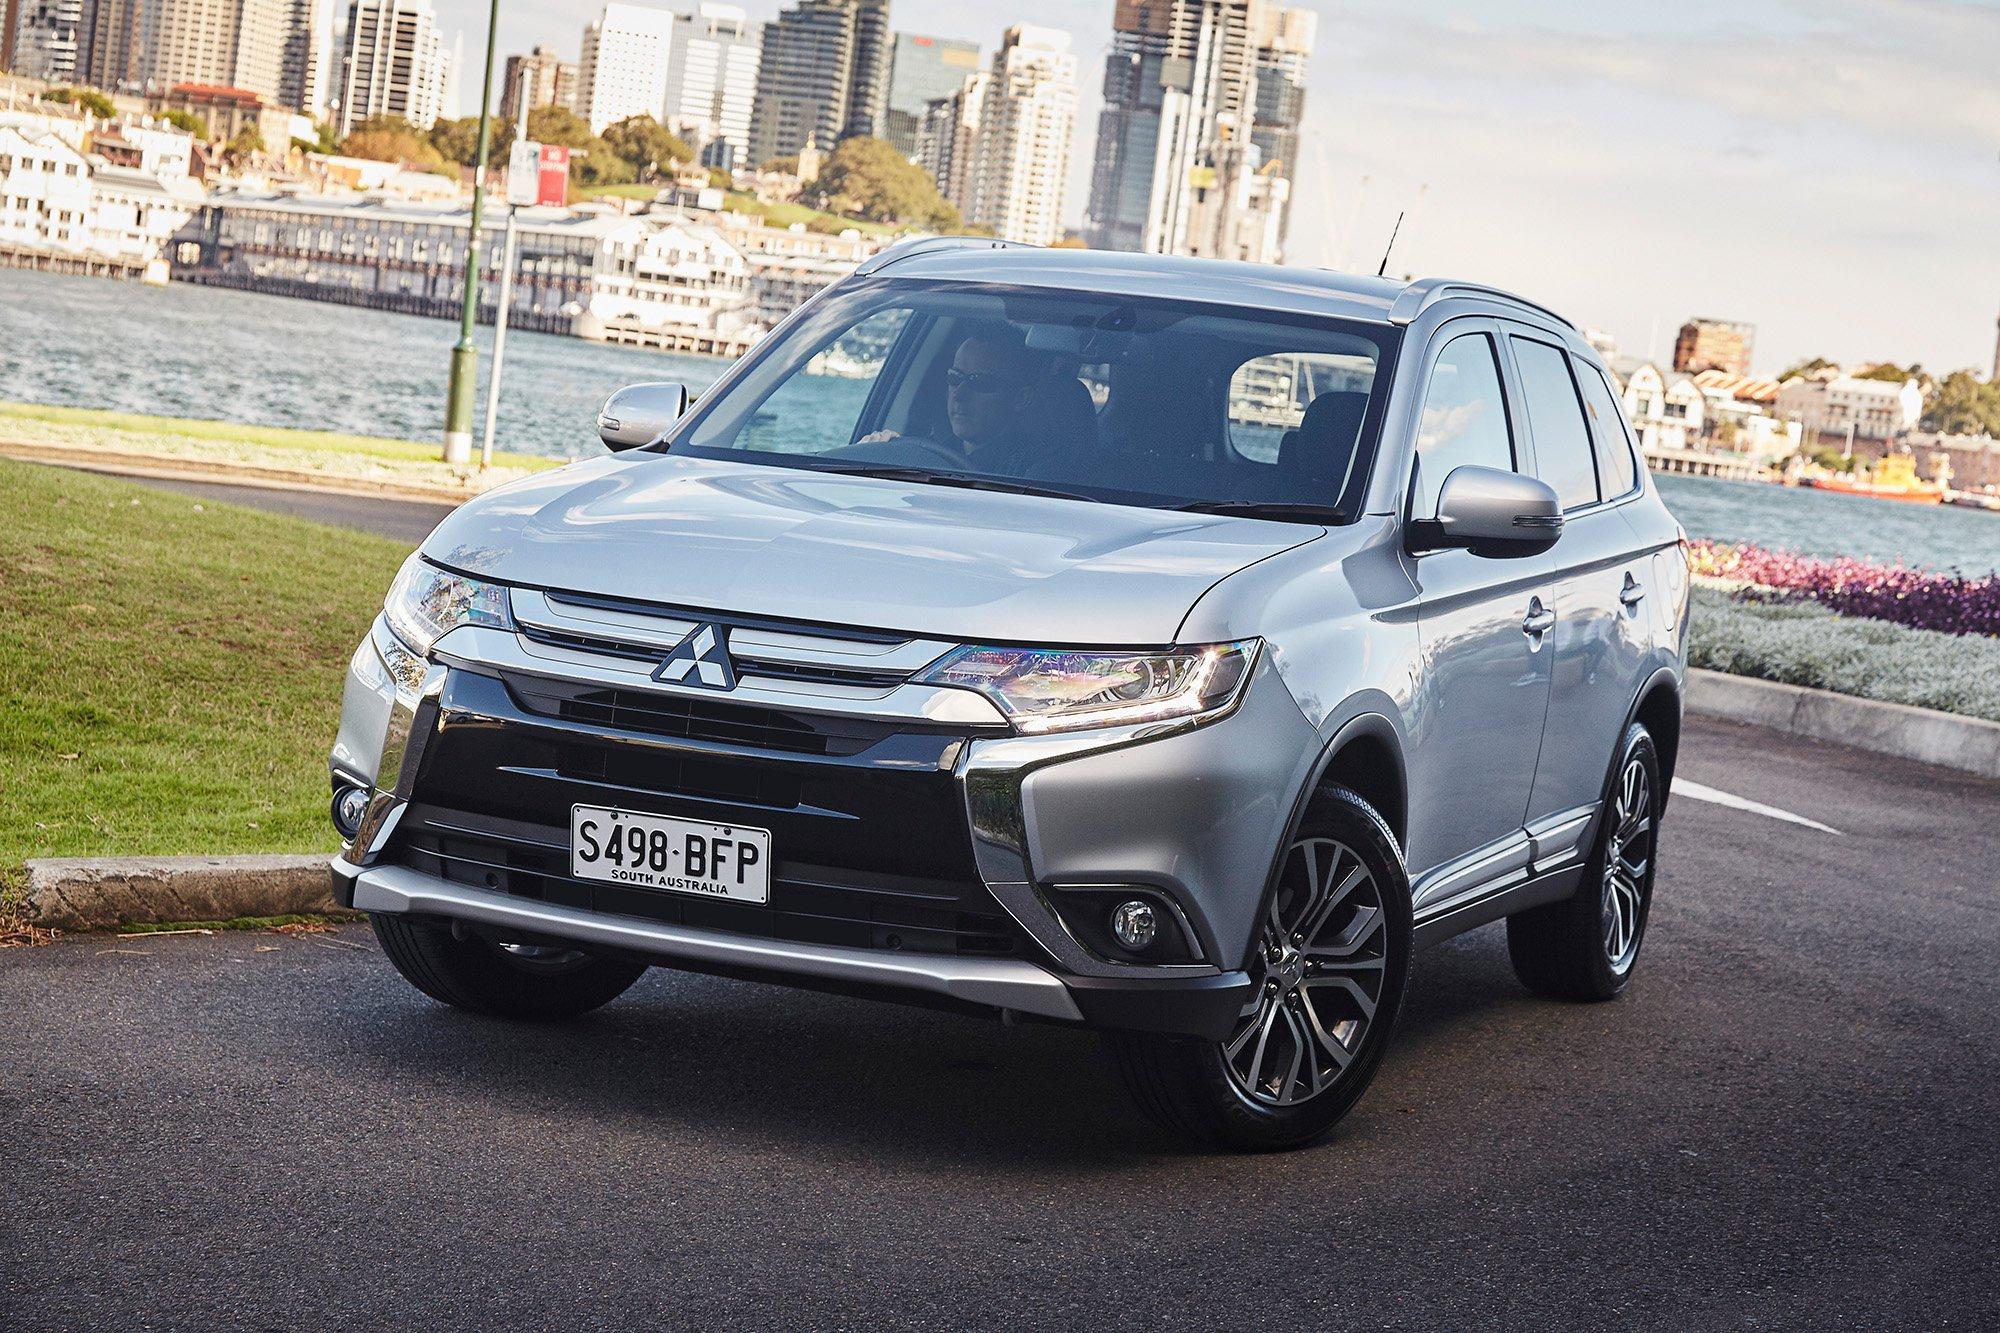 2016 Mitsubishi Outlander Review | CarAdvice